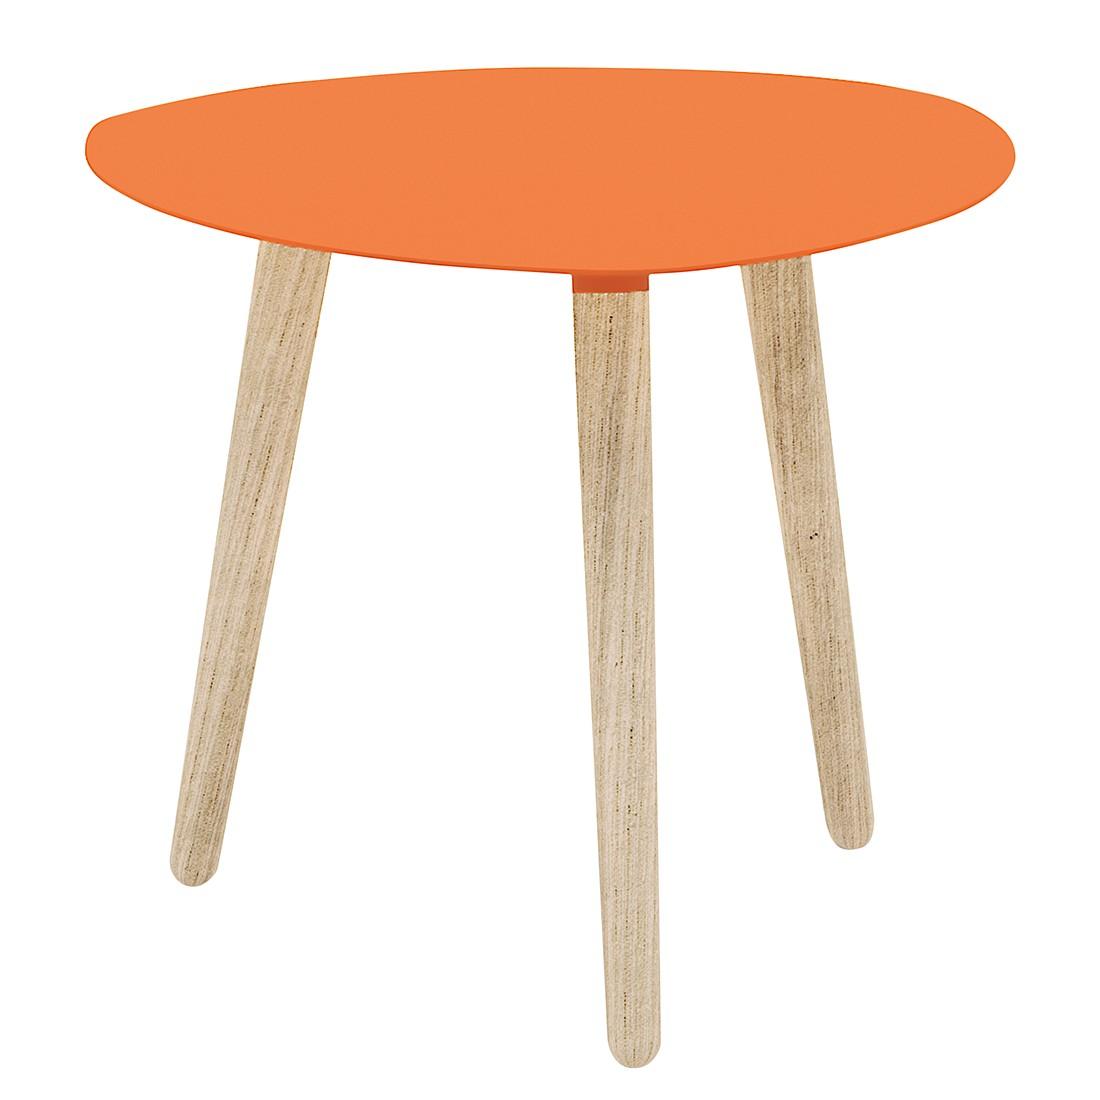 couchtisch nord petalo metall esche massiv orange. Black Bedroom Furniture Sets. Home Design Ideas